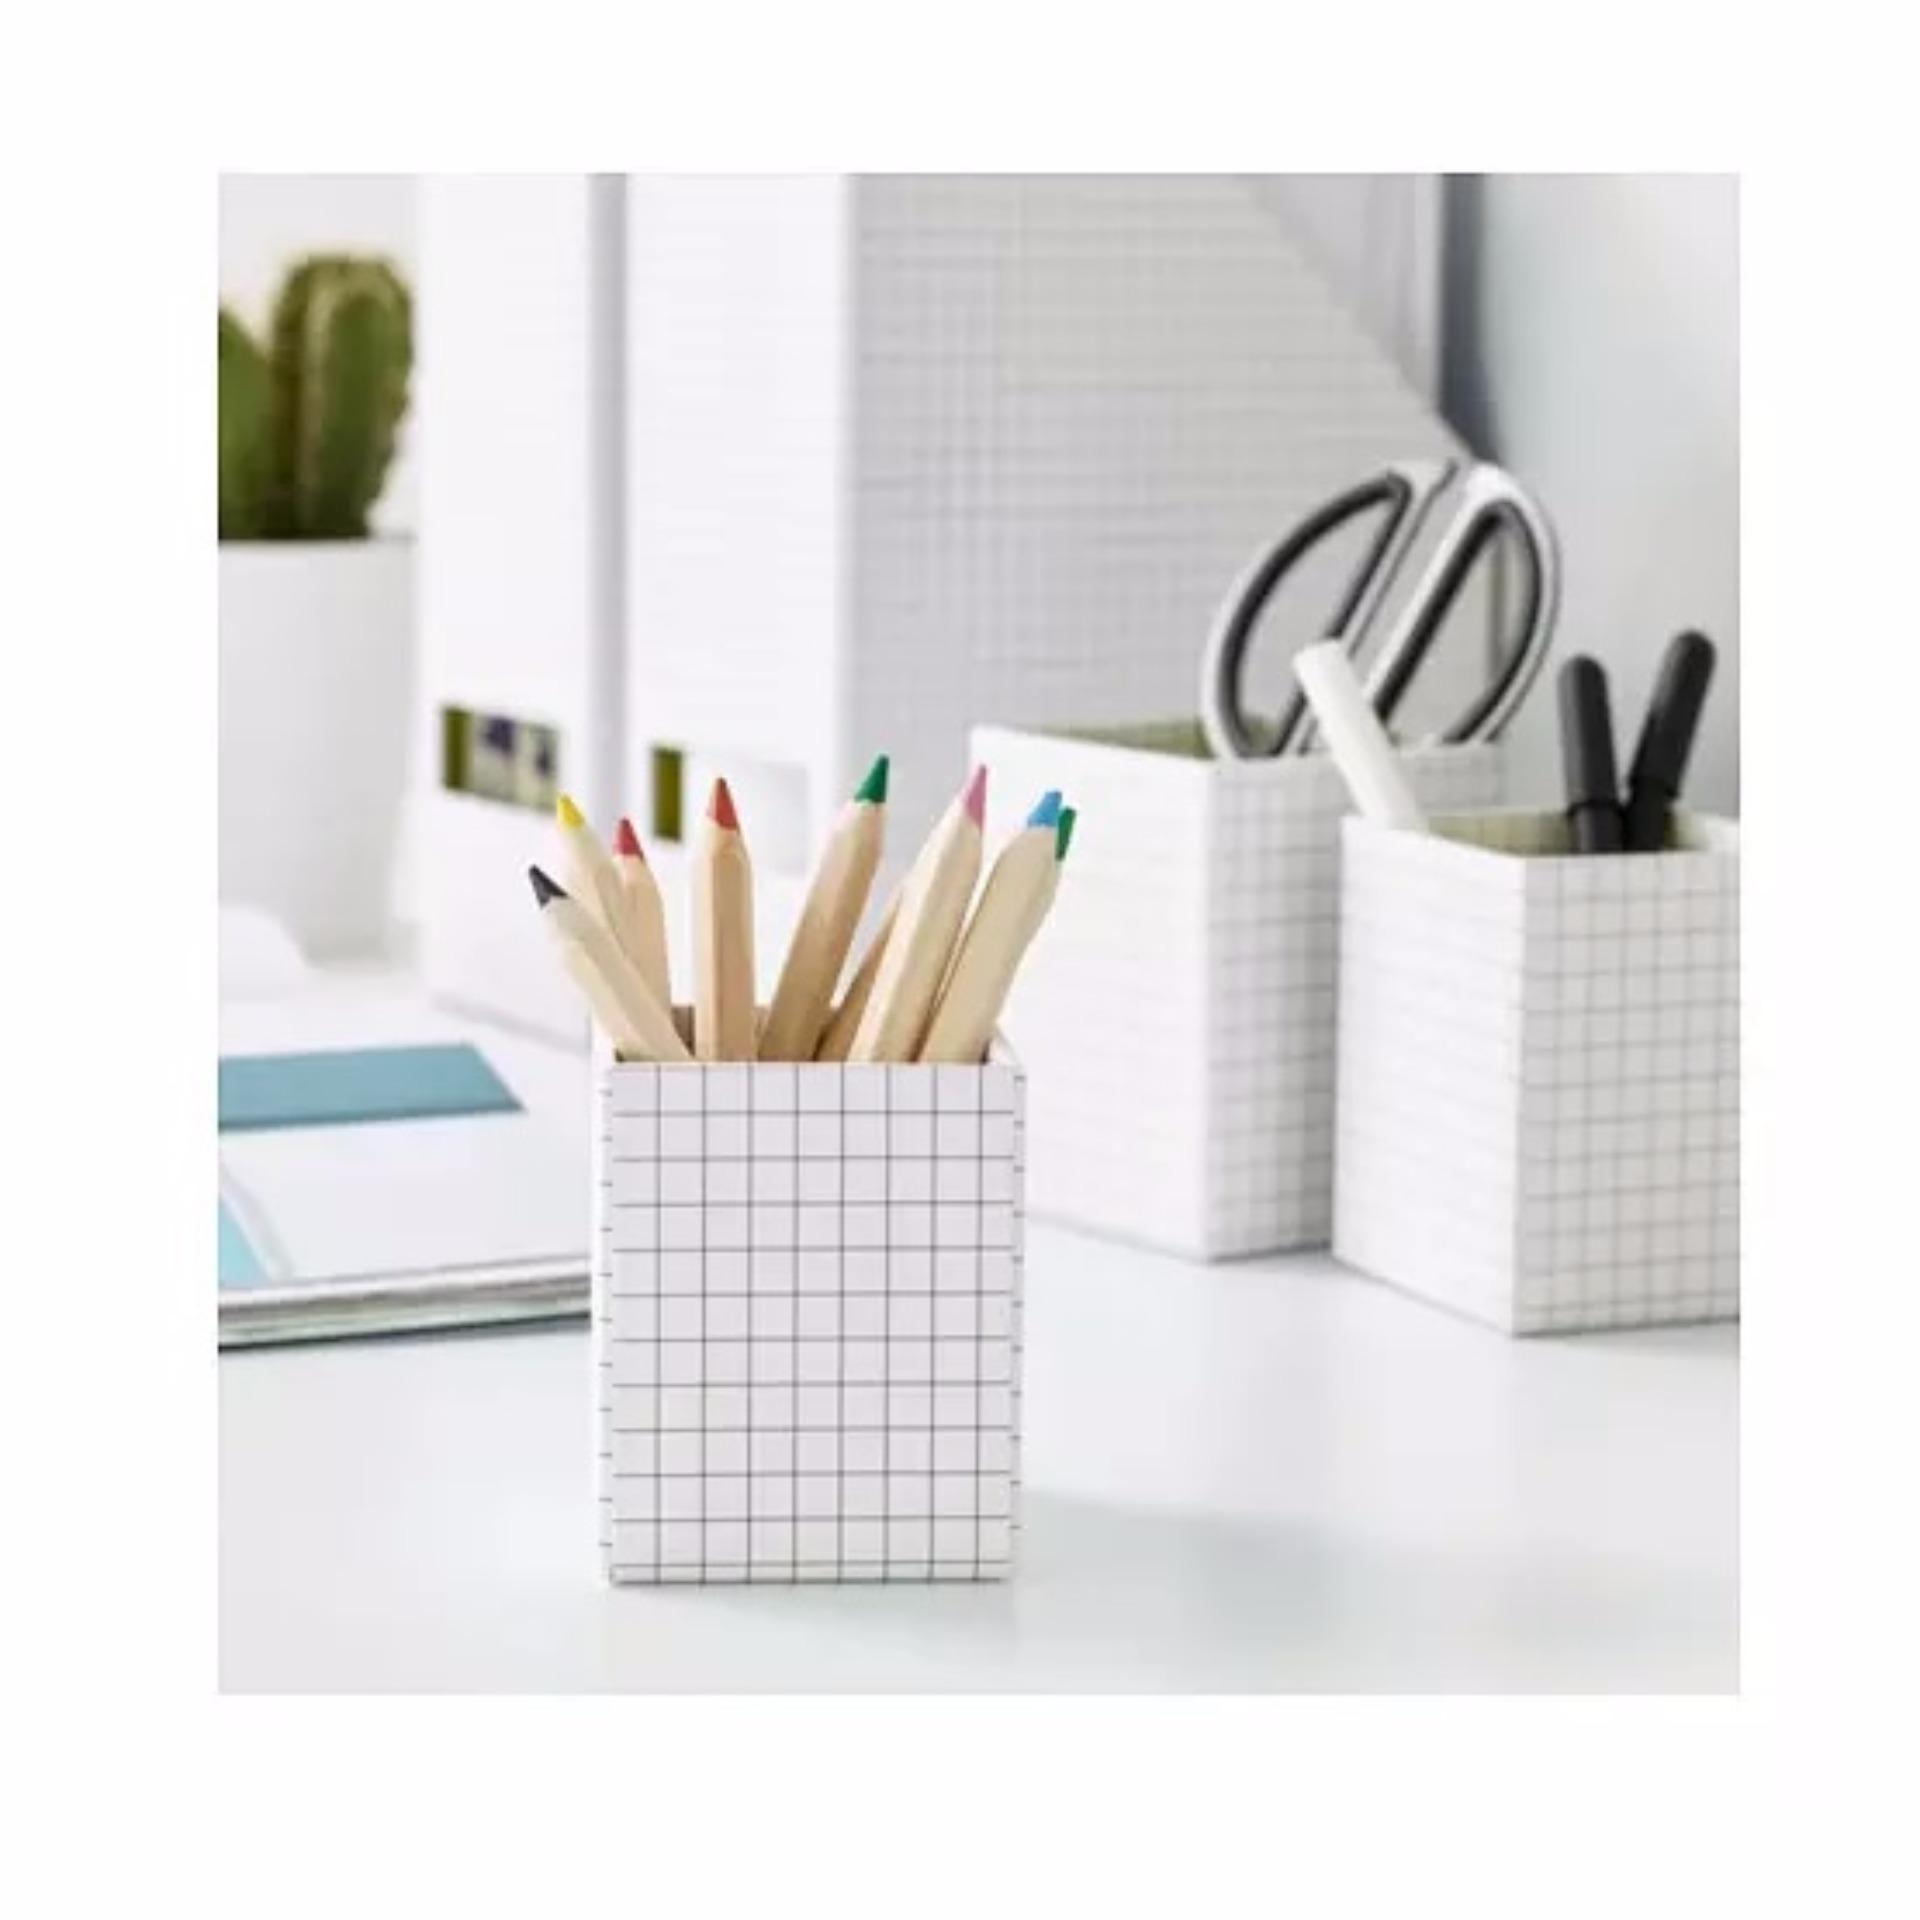 Ikea Gliss Box Dengan Tutup 3 Piece Kuning Putih Pink Daftar Source IKEA .